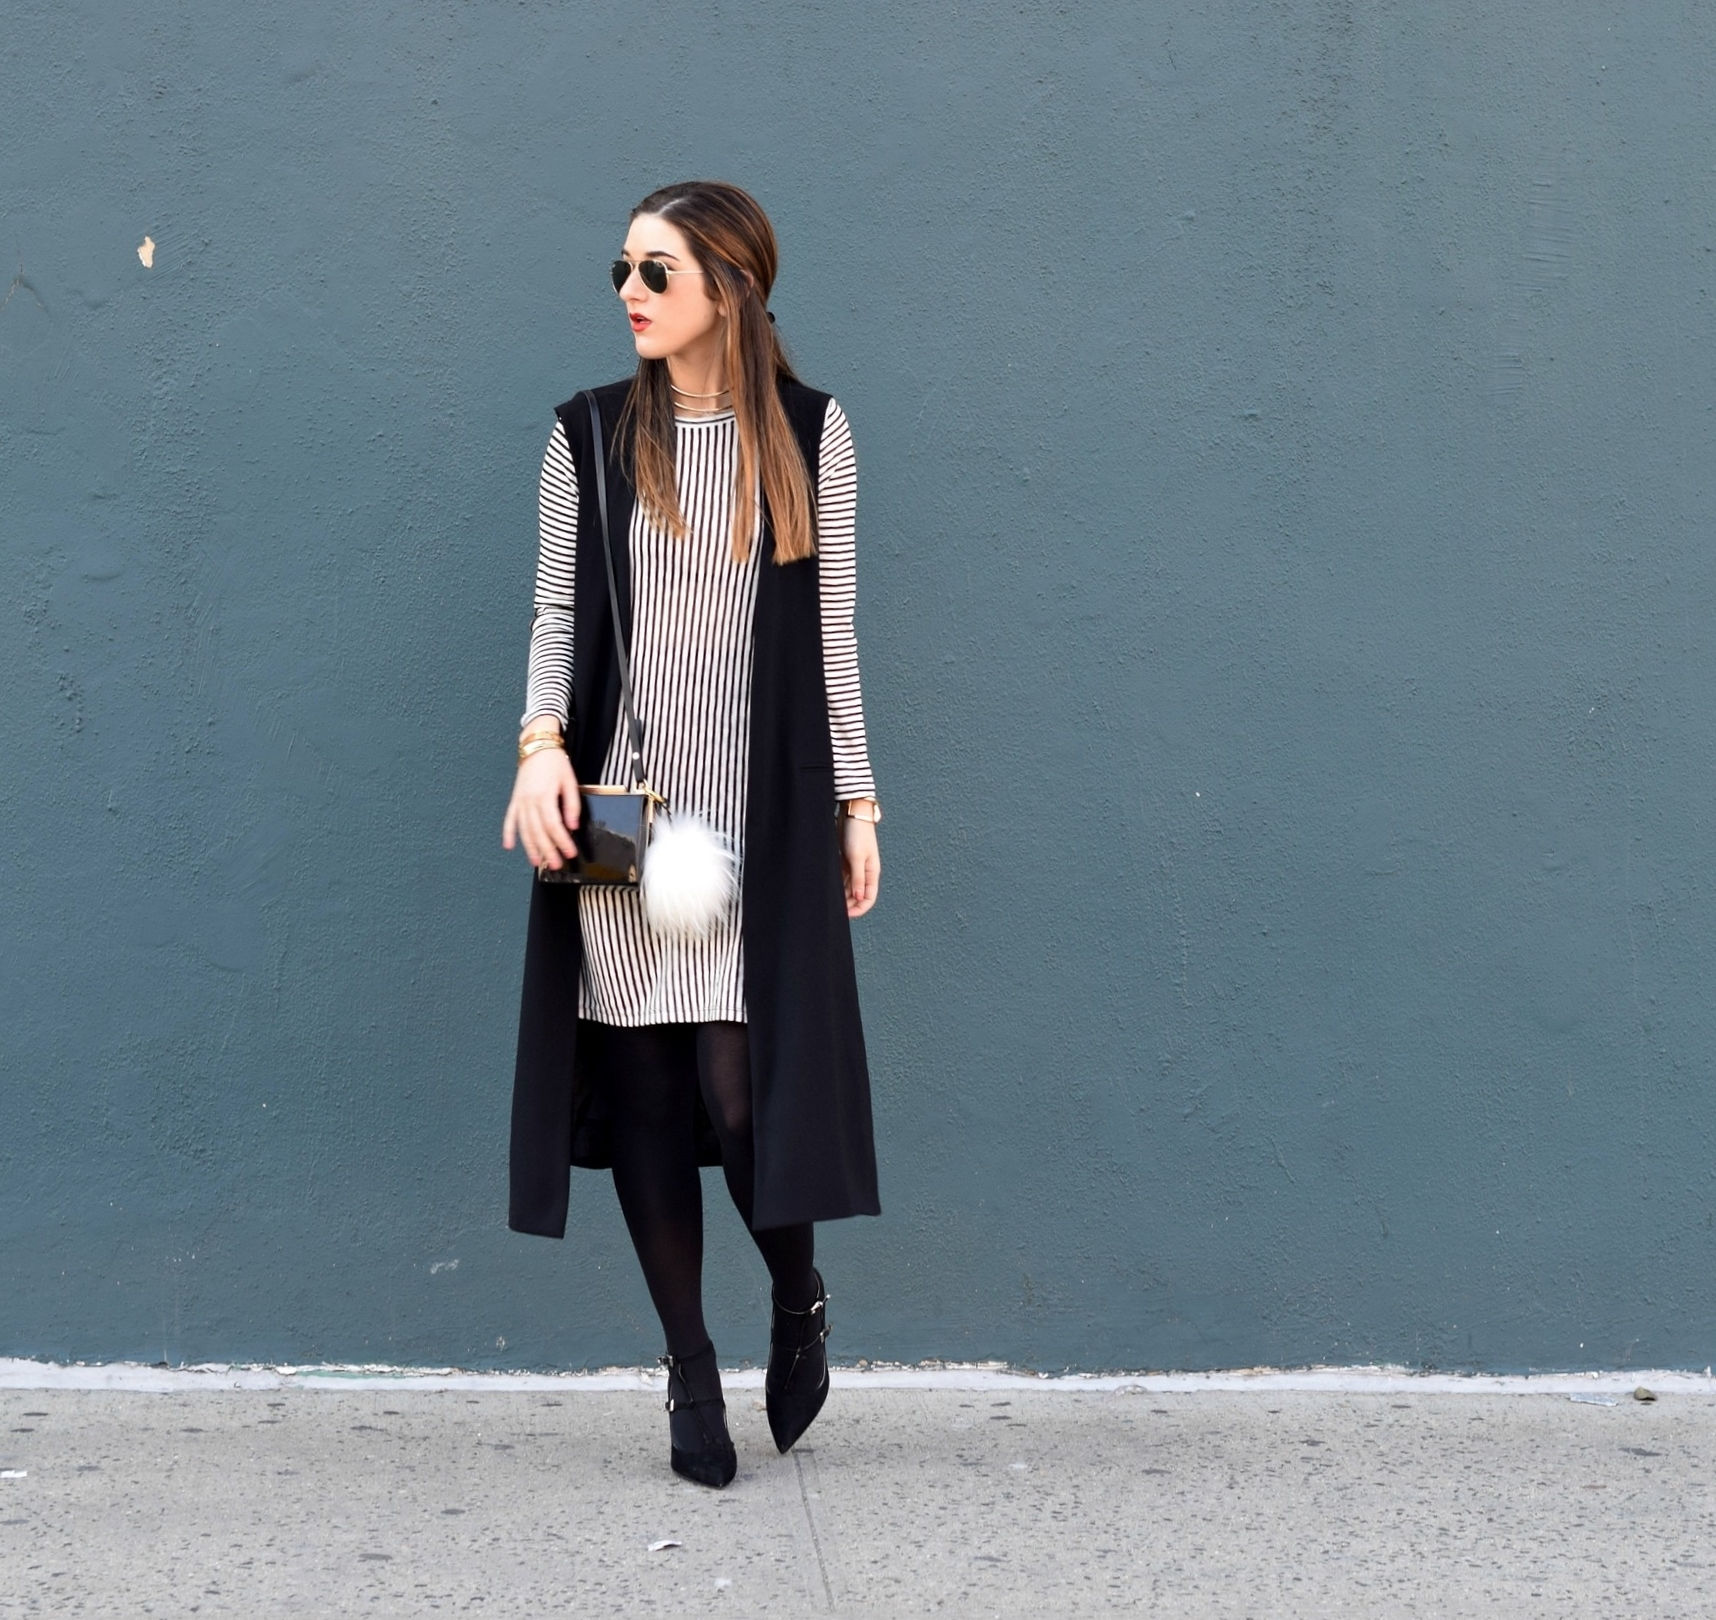 7c3f24a35a Black and White Striped Shirt Dress Long Vest Louboutins   Love Fashion  Blog Esther Santer NYC